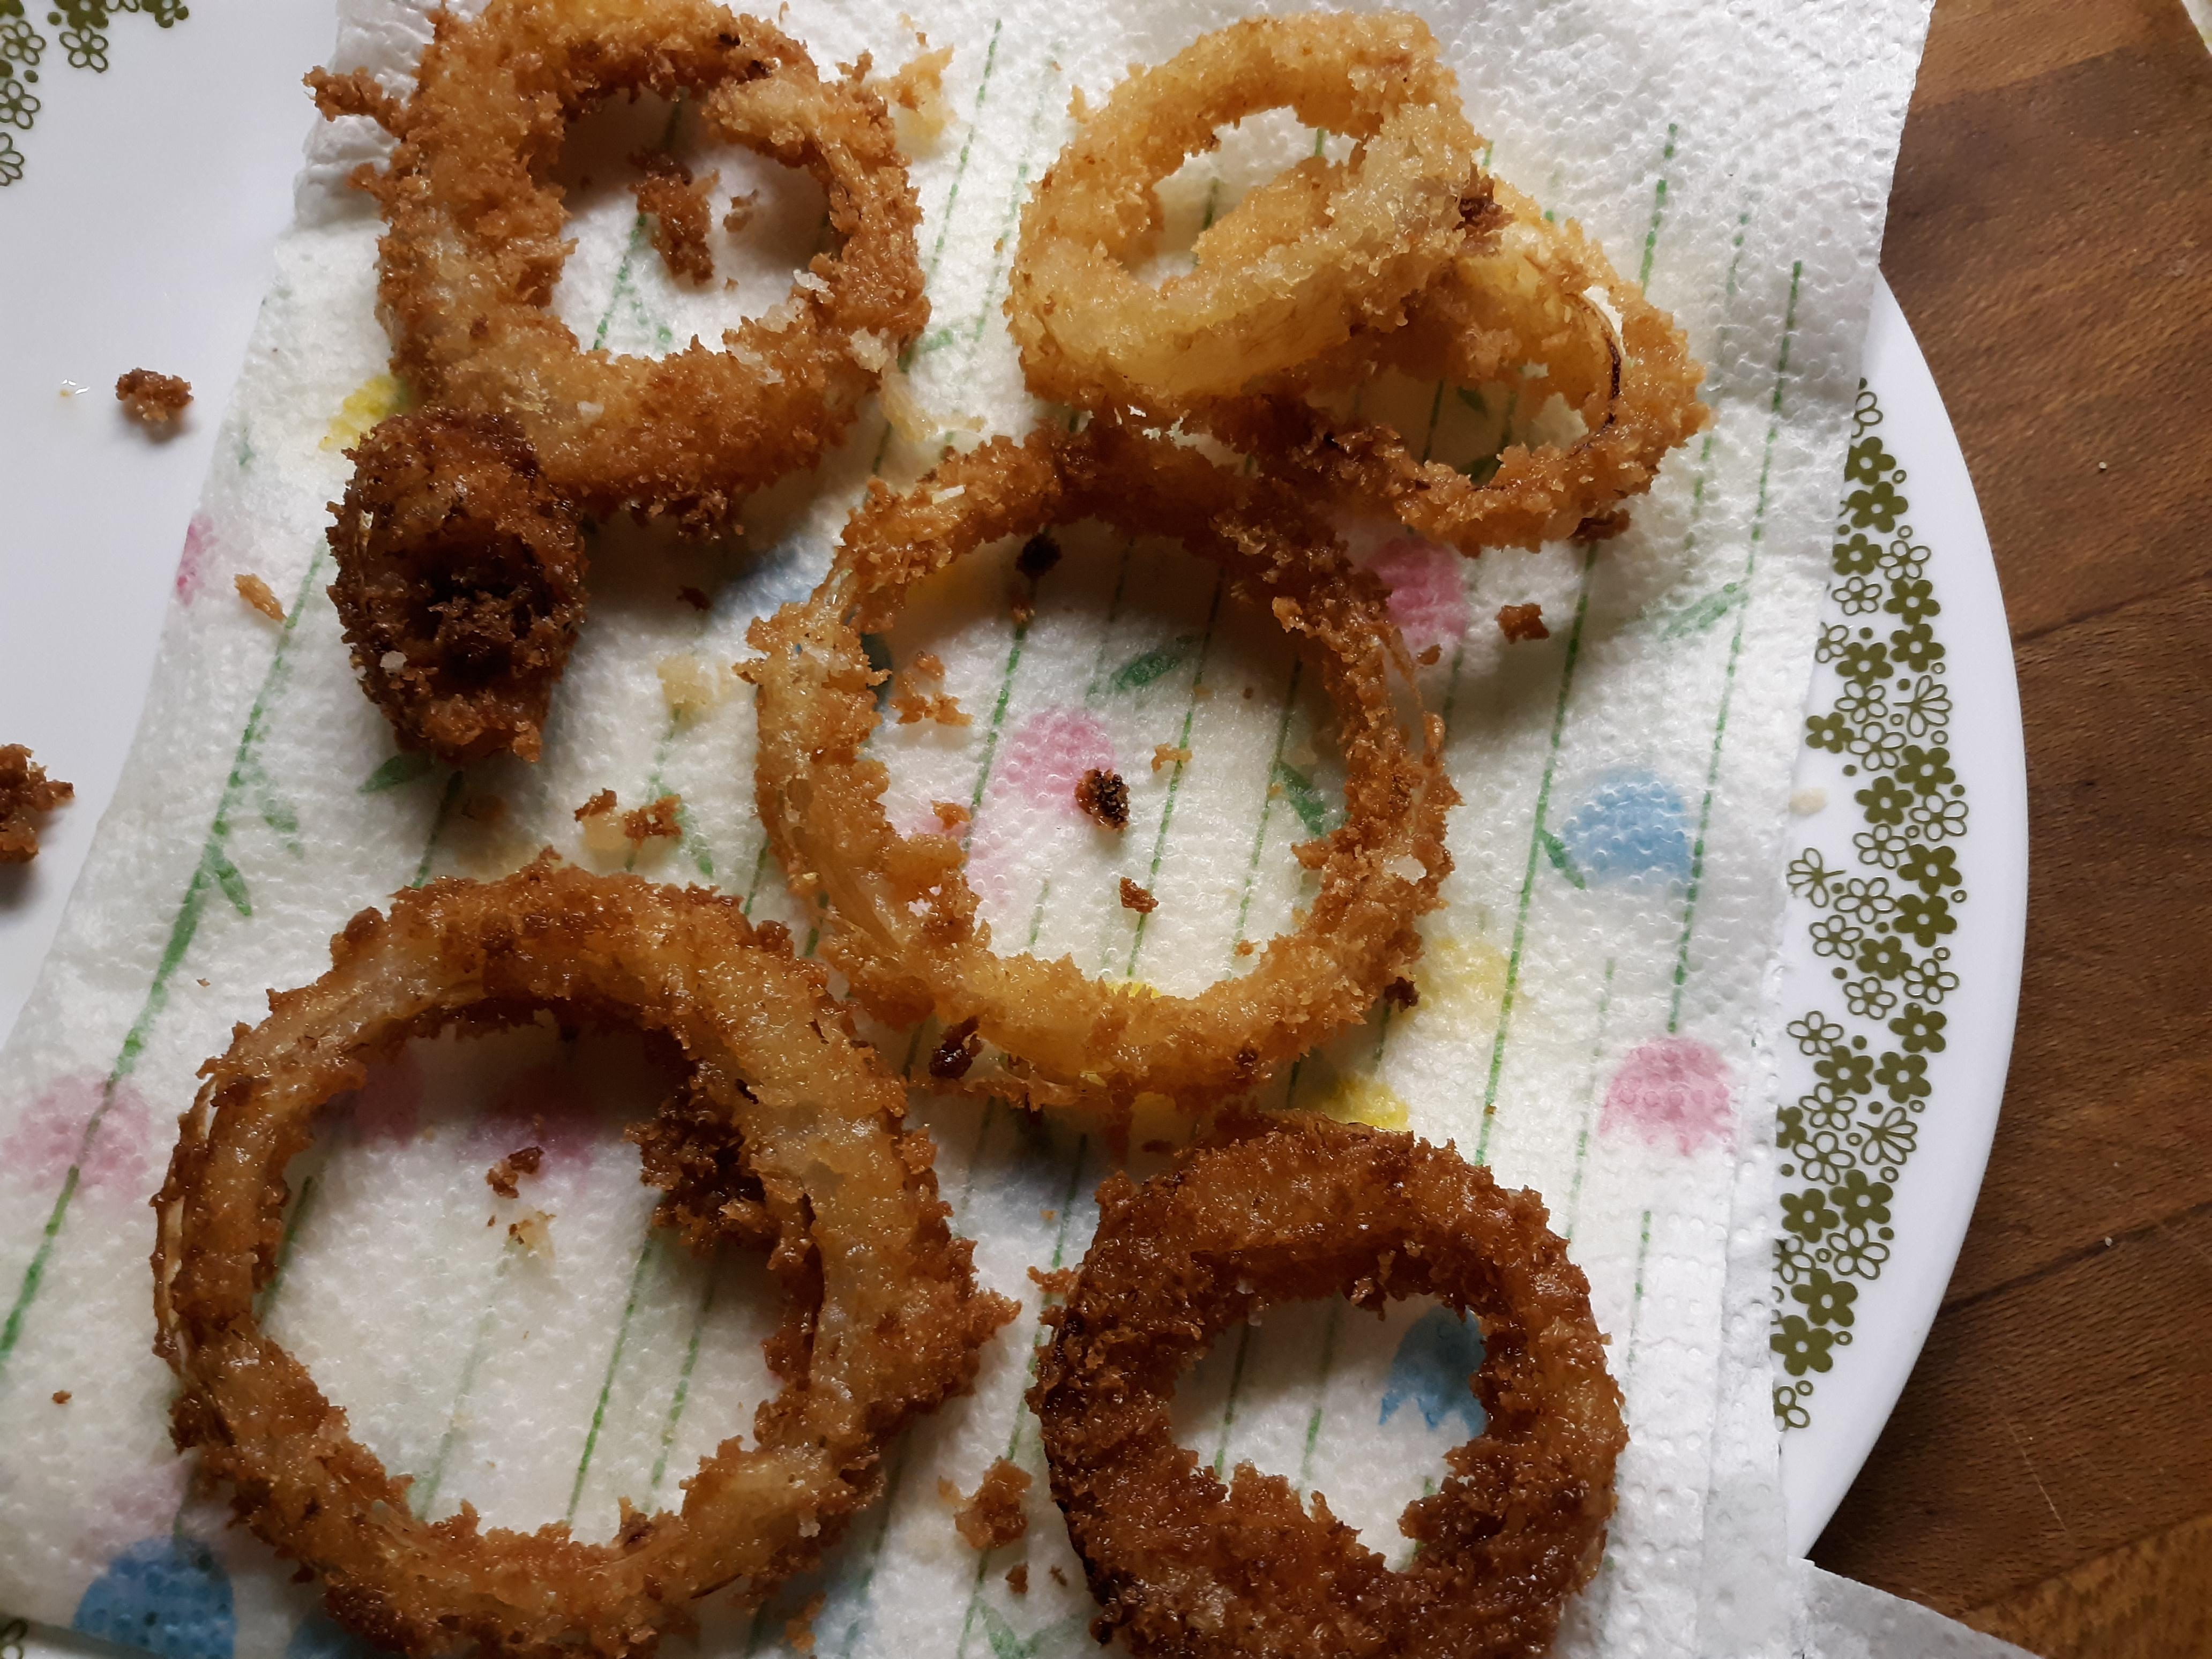 Making Crispy Onion Rings